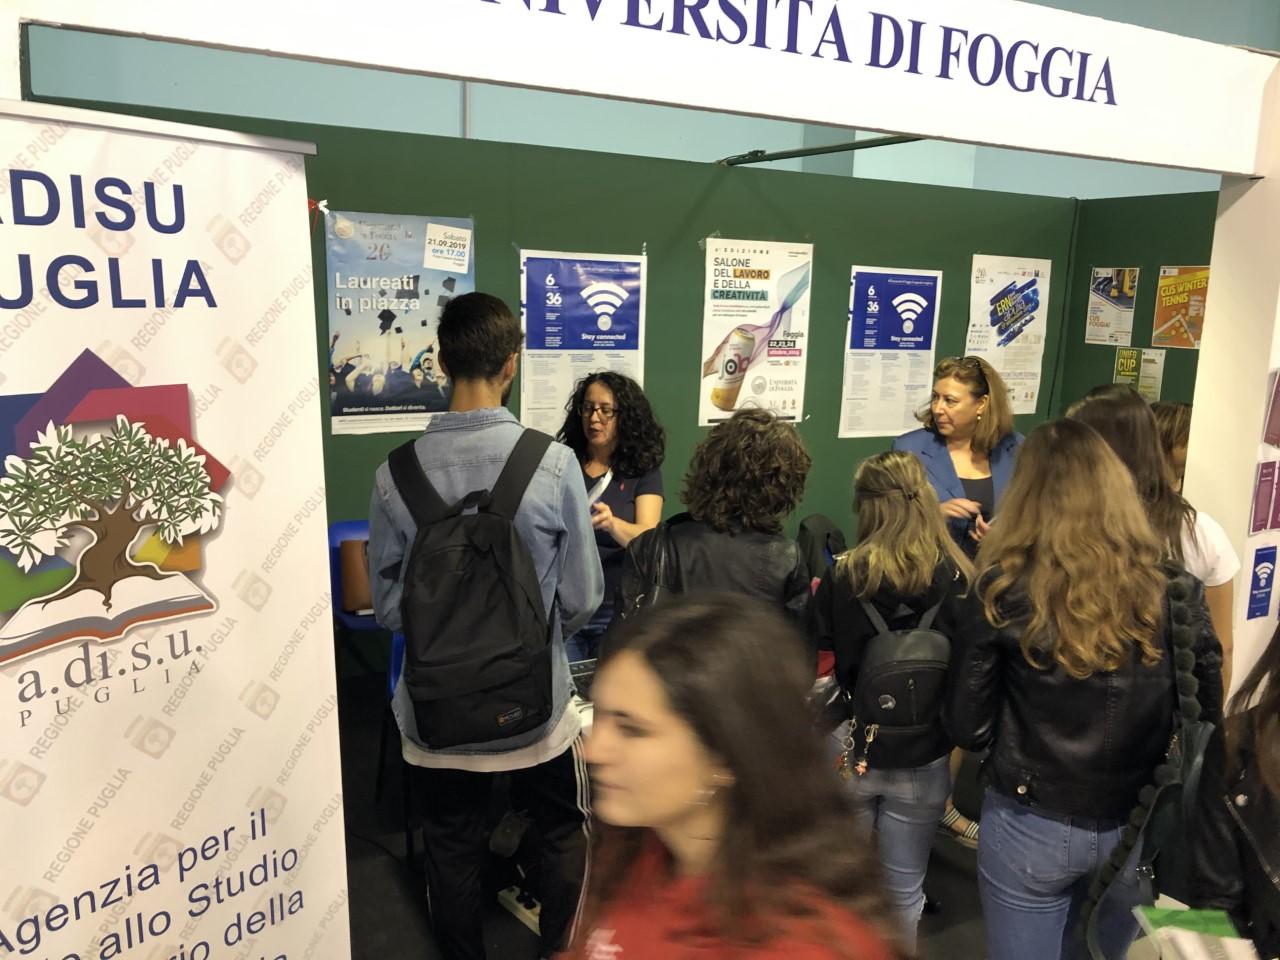 L'ADISU Puglia all'ORIENTA Puglia 2019 di Foggia